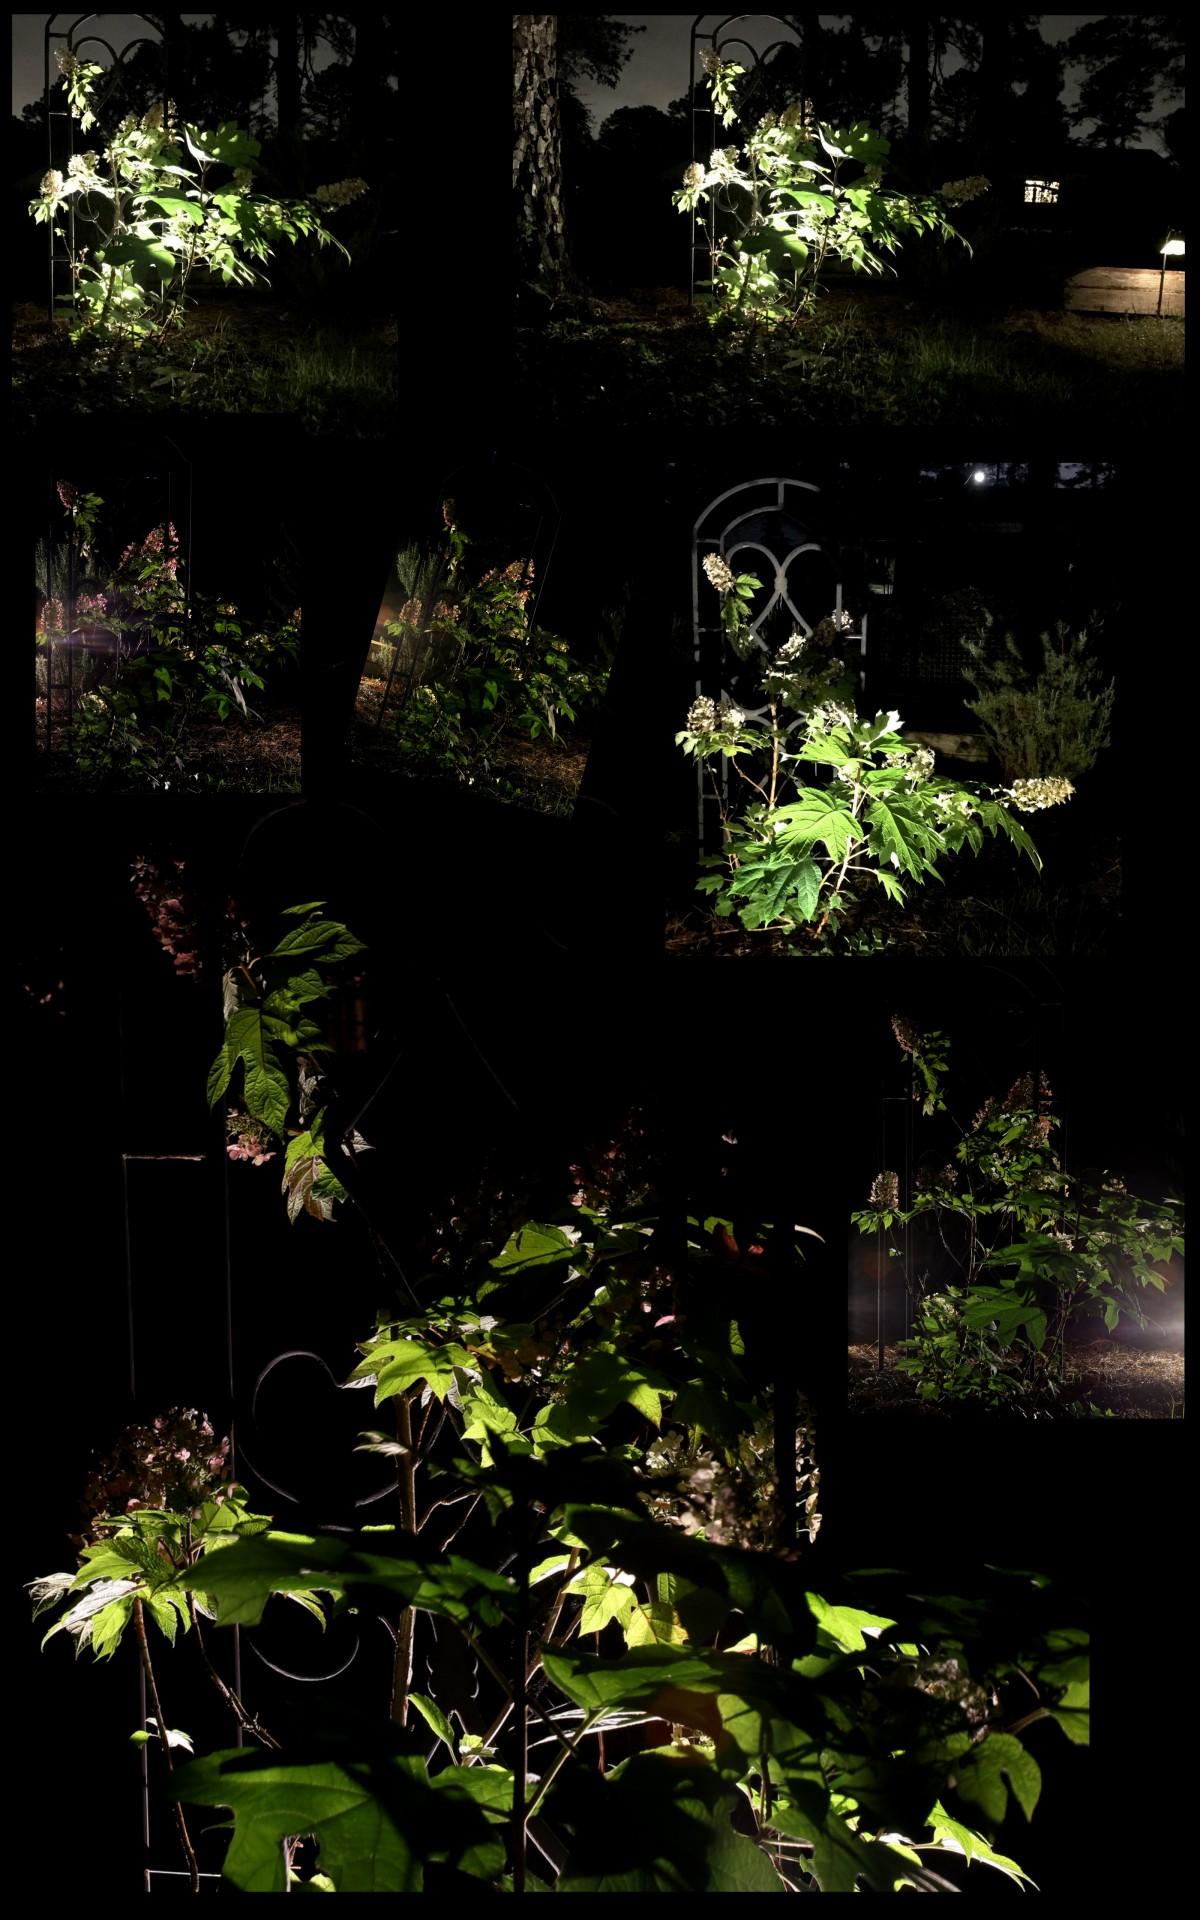 Photography ~ Backyard Landscaping–A Trellis & Oakleaf Hydrangea After Dark Collage & Slideshow, 05/24 &05/27